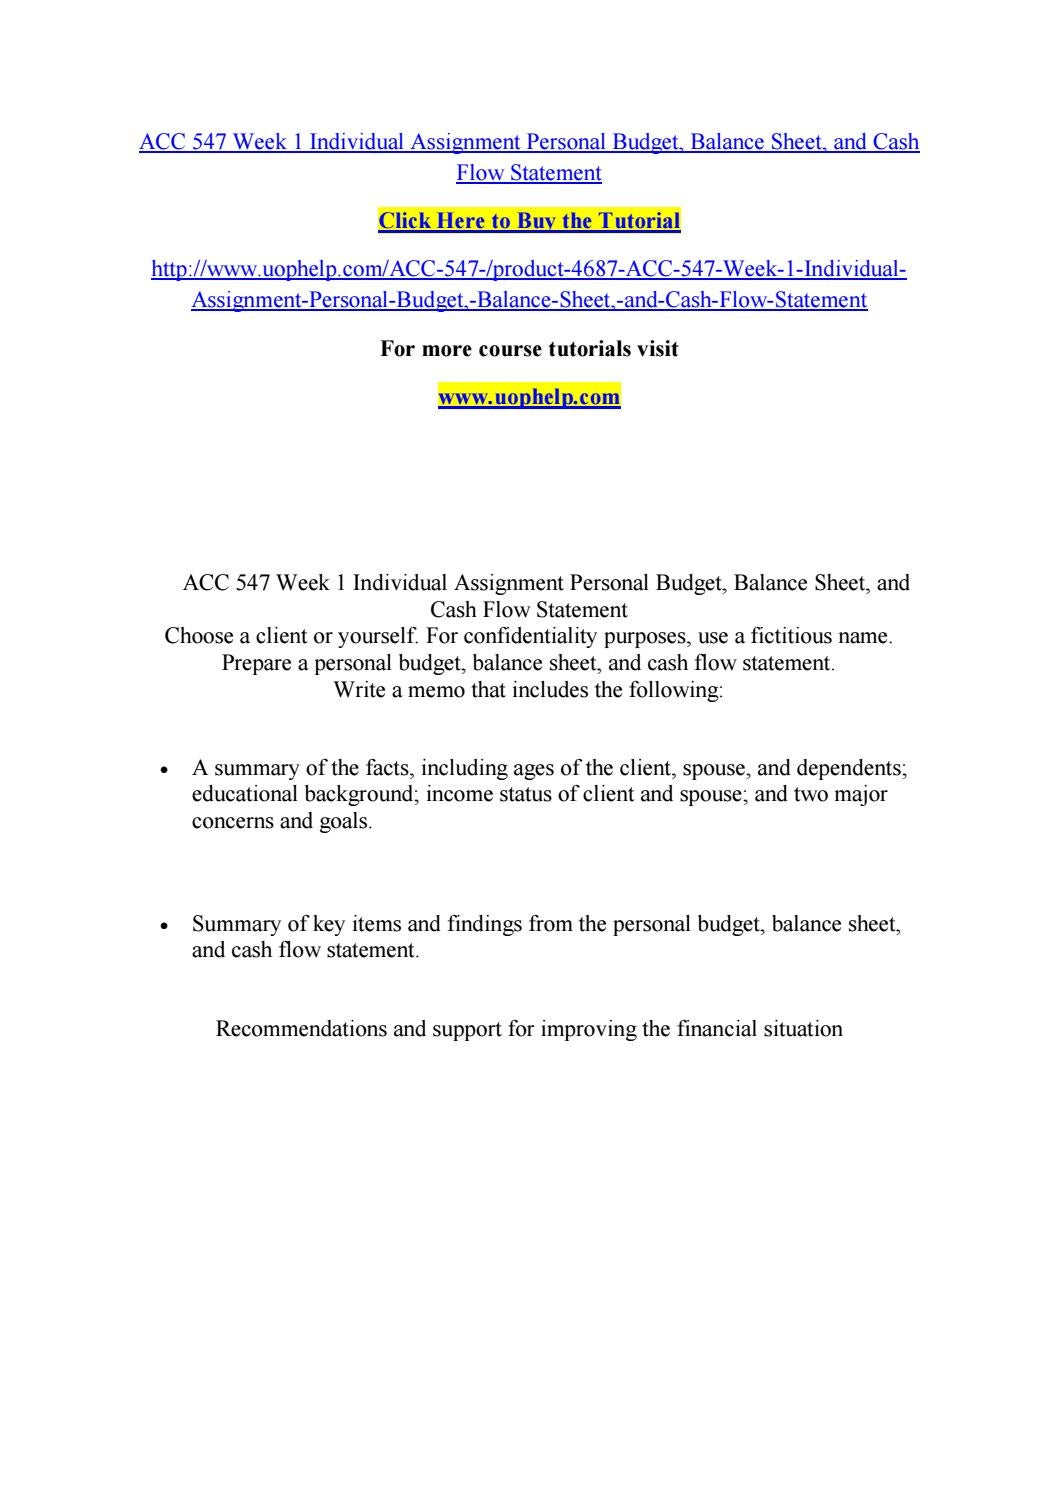 acc 547 week 1 individual assignment personal budget balance sheet